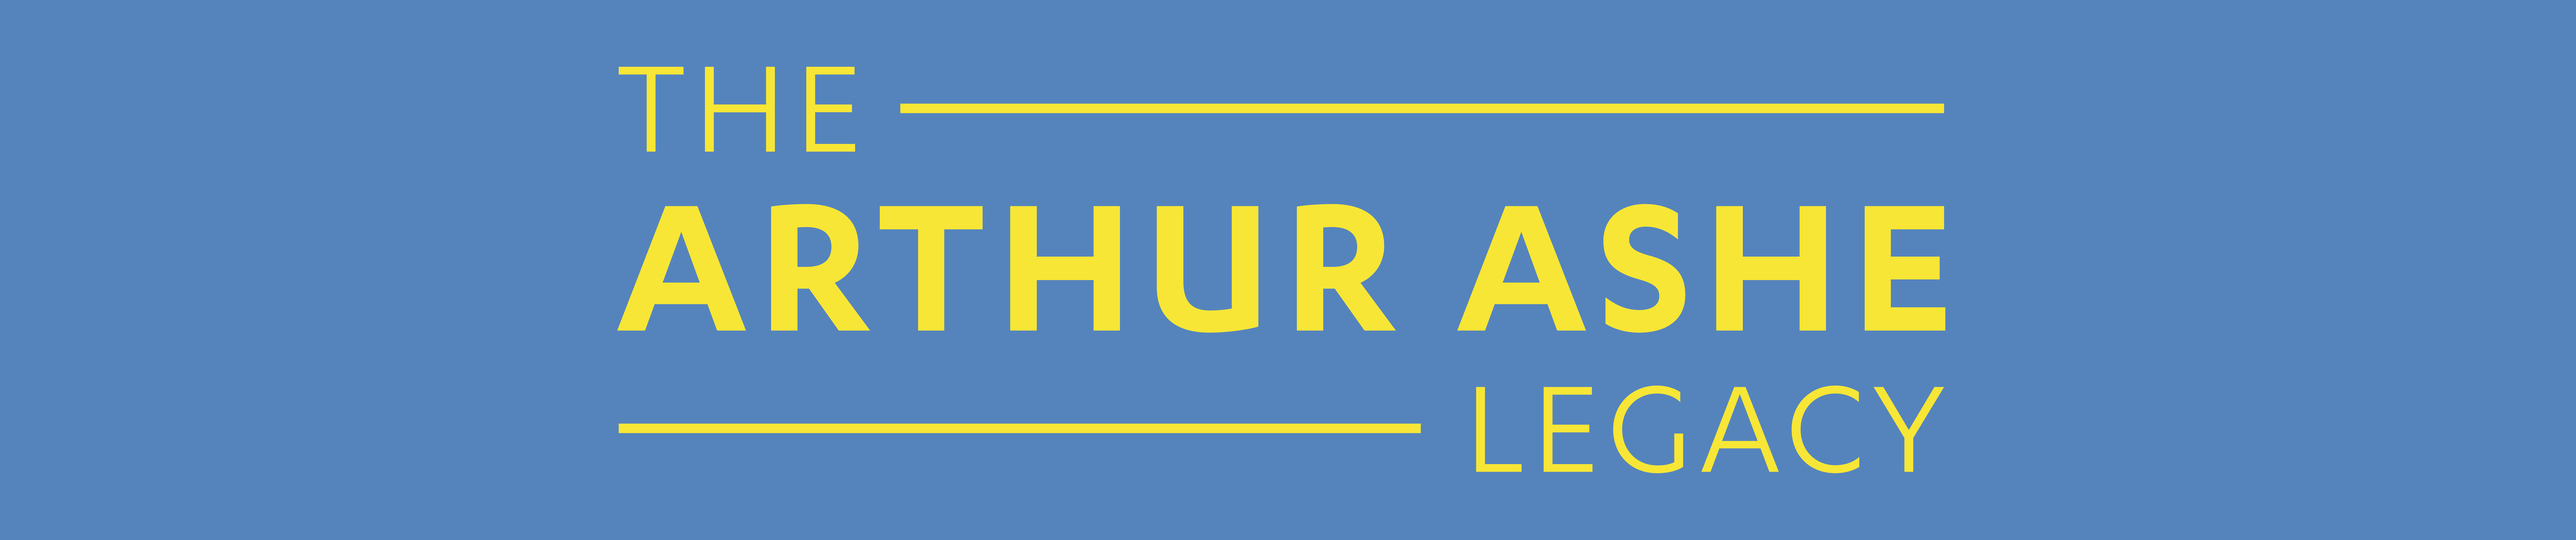 Arthur Ashe Legacy